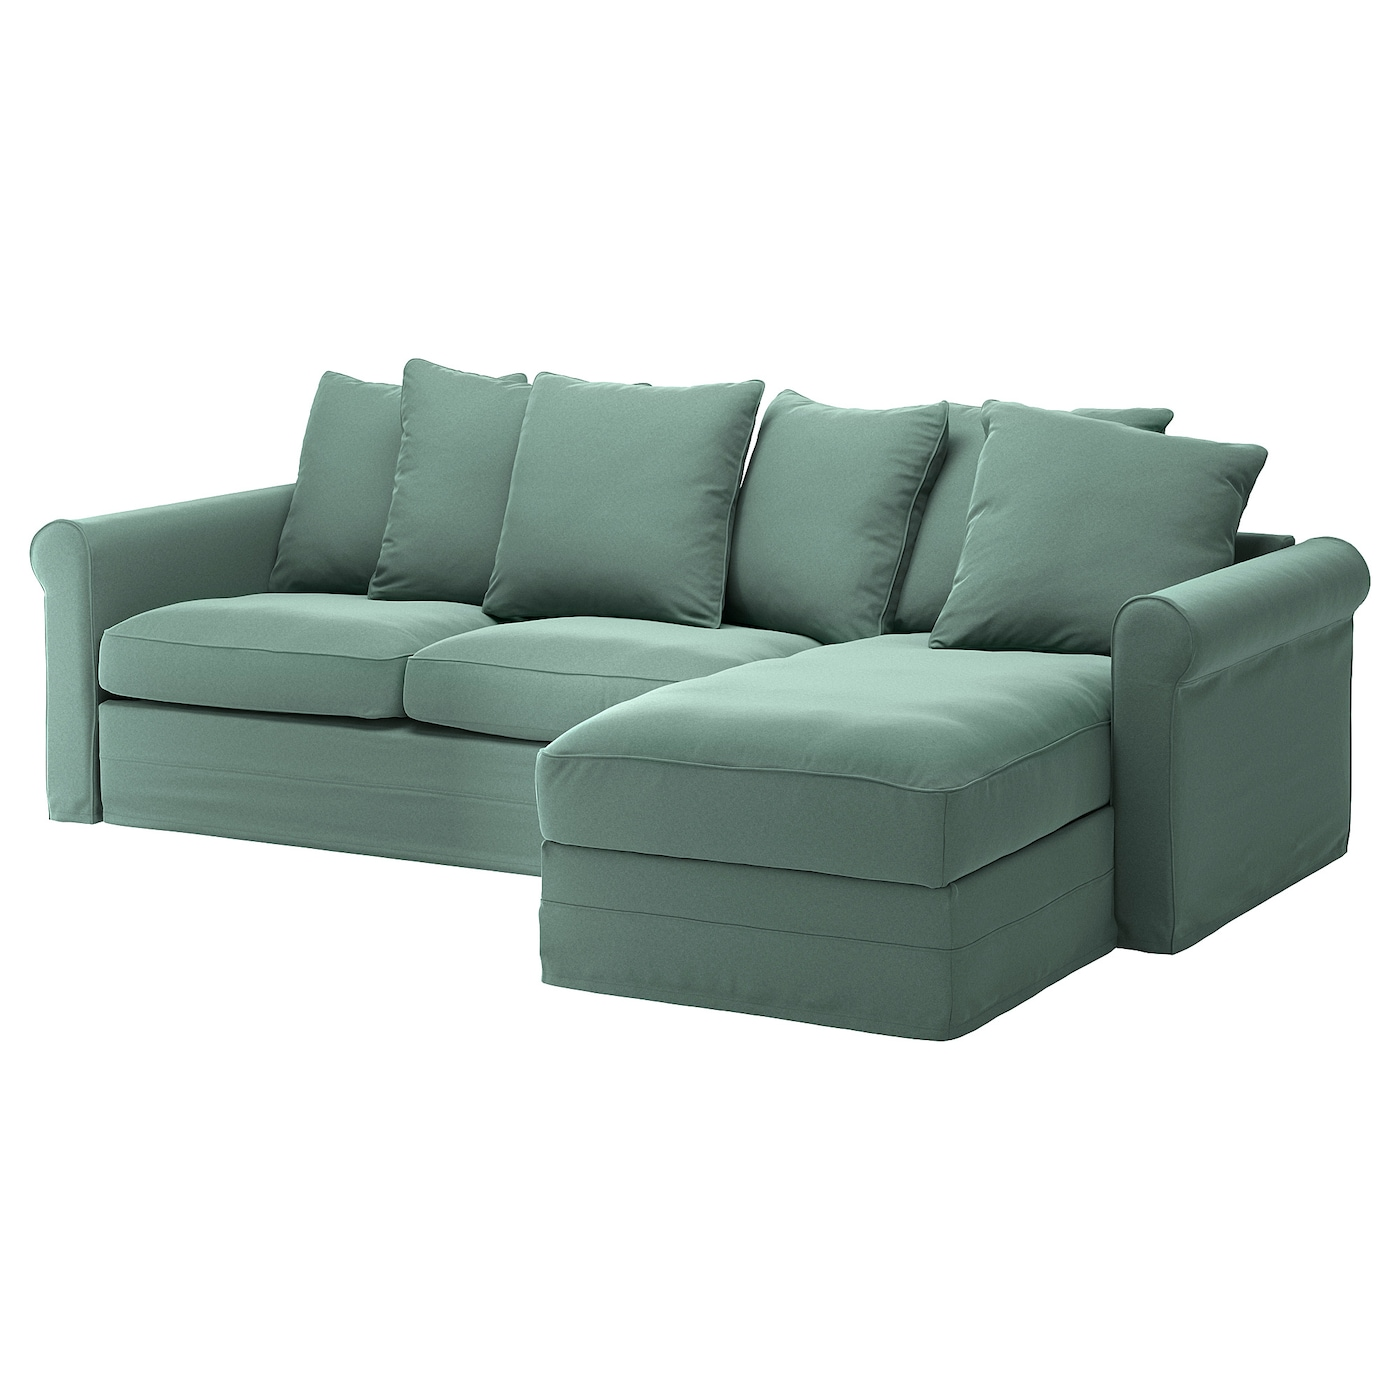 - GRÖNLID 3-seat Sofa-bed - With Chaise Longue, Ljungen Light Green